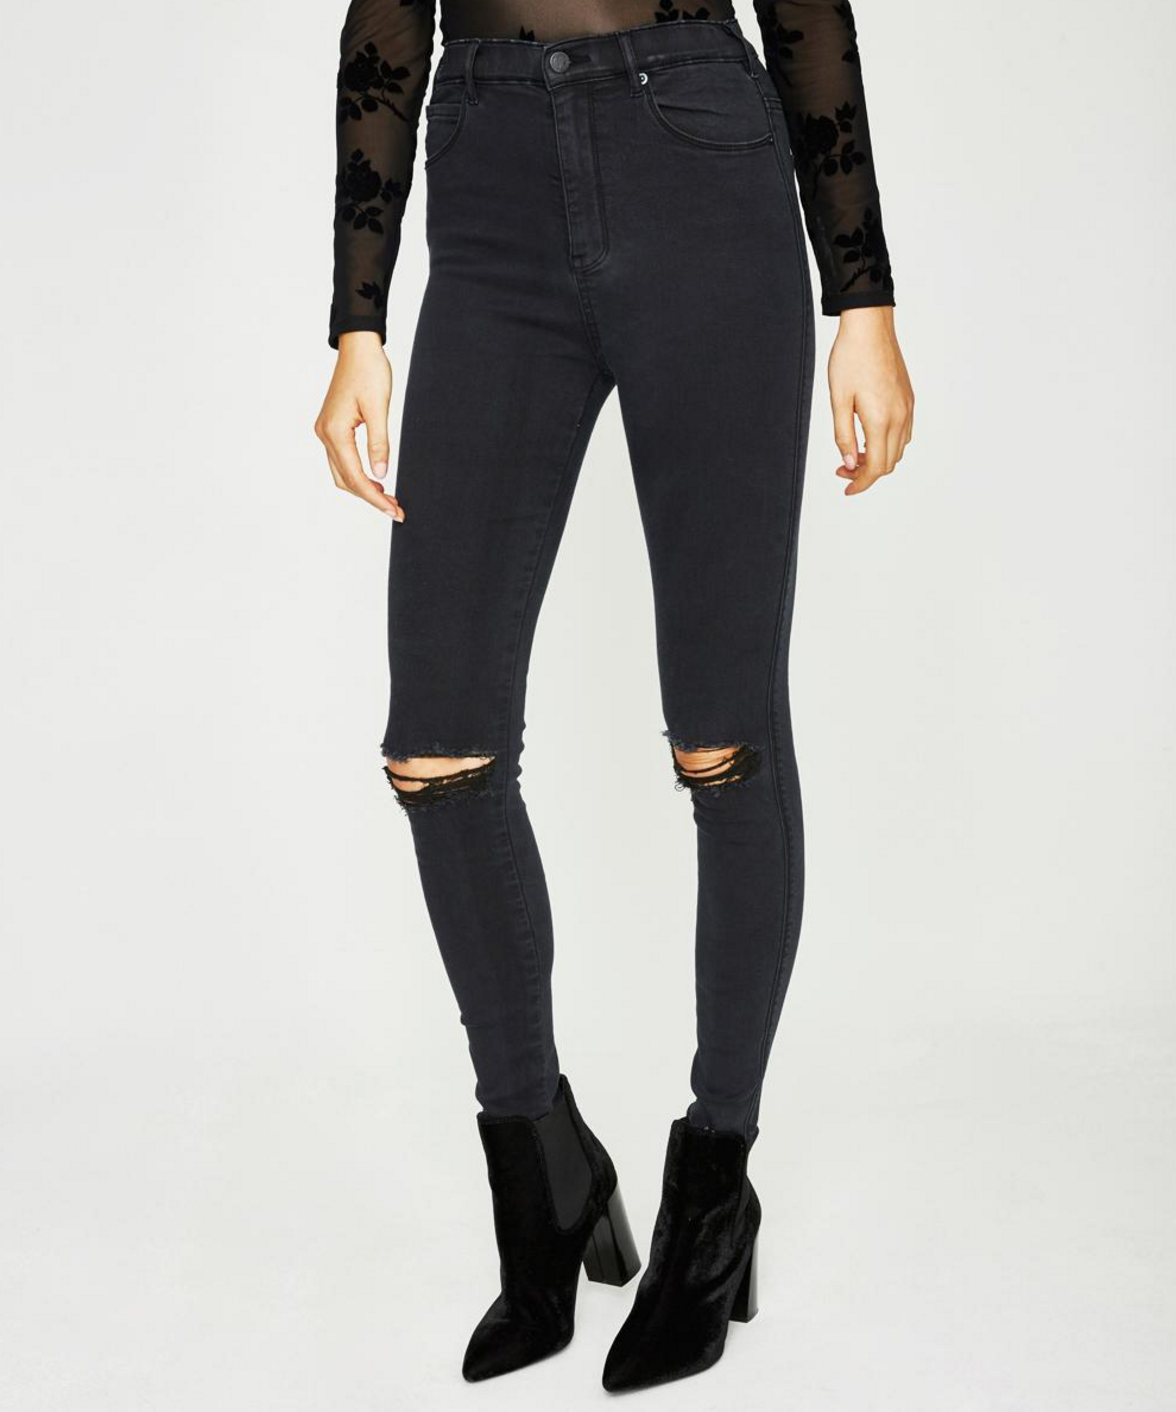 Neon Hart Patti ripped jeans $79.99